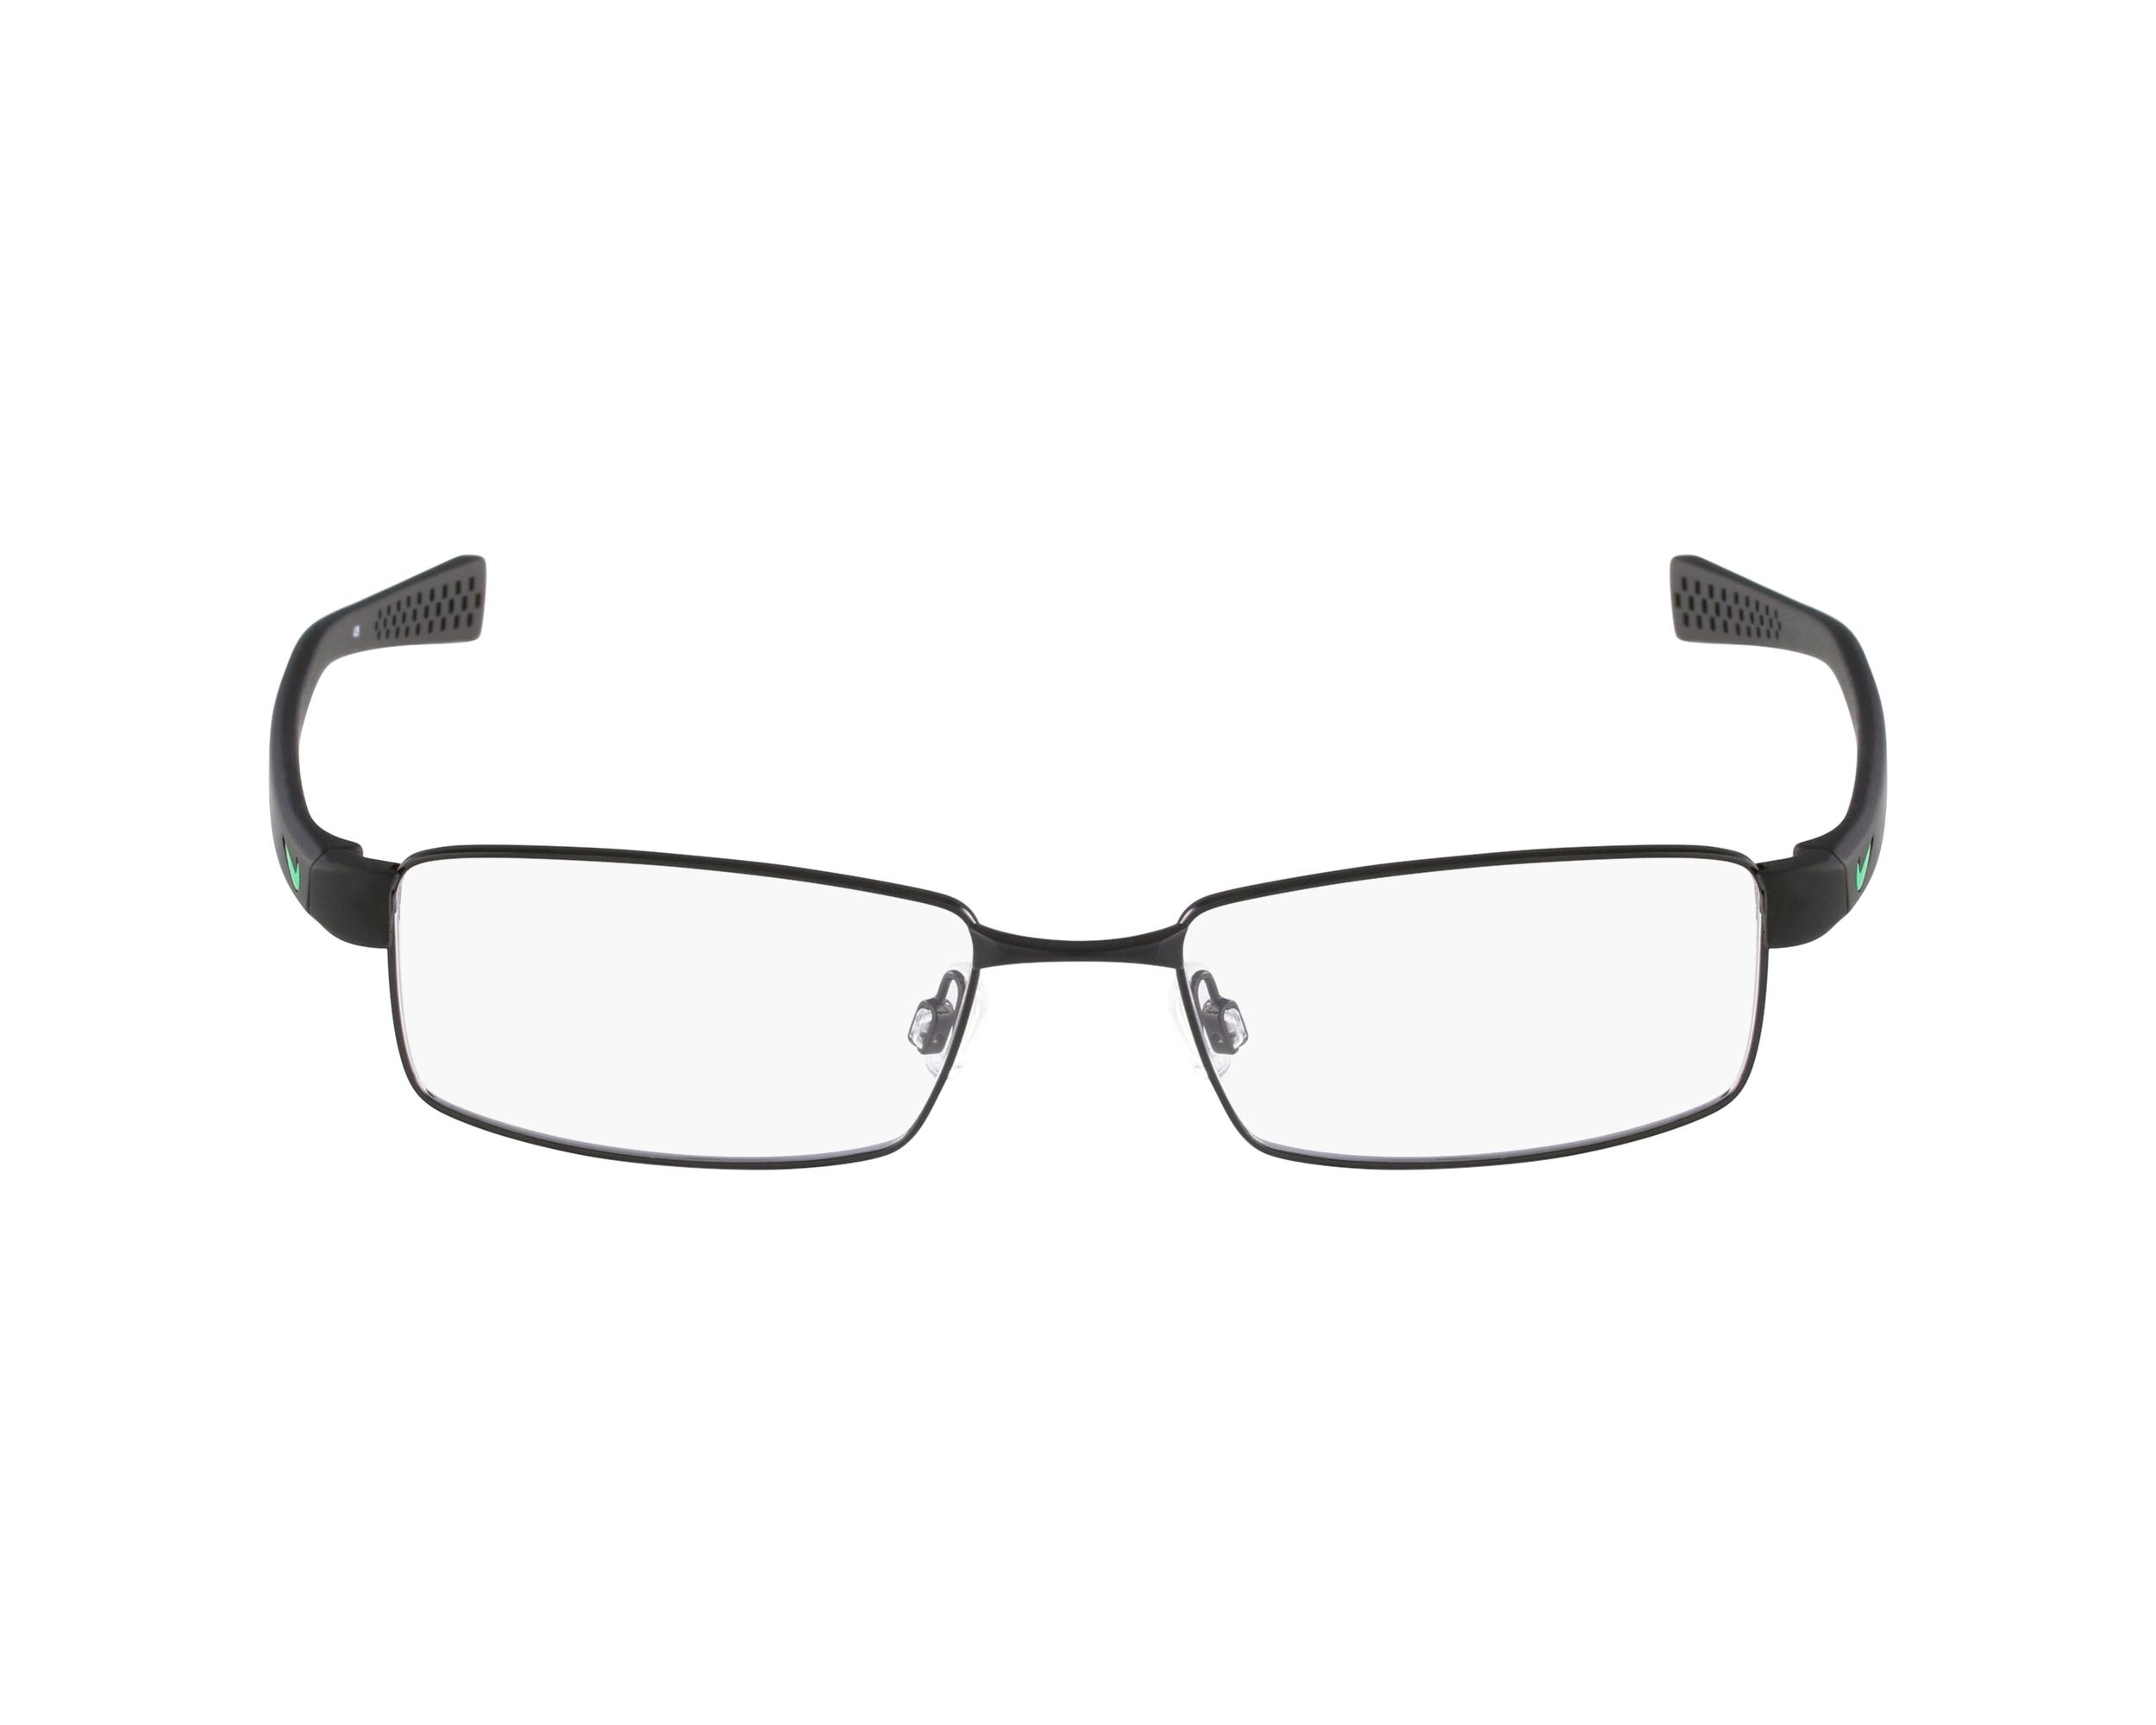 9fe0bff0569 eyeglasses Nike 8162 010 - Black Green profile view